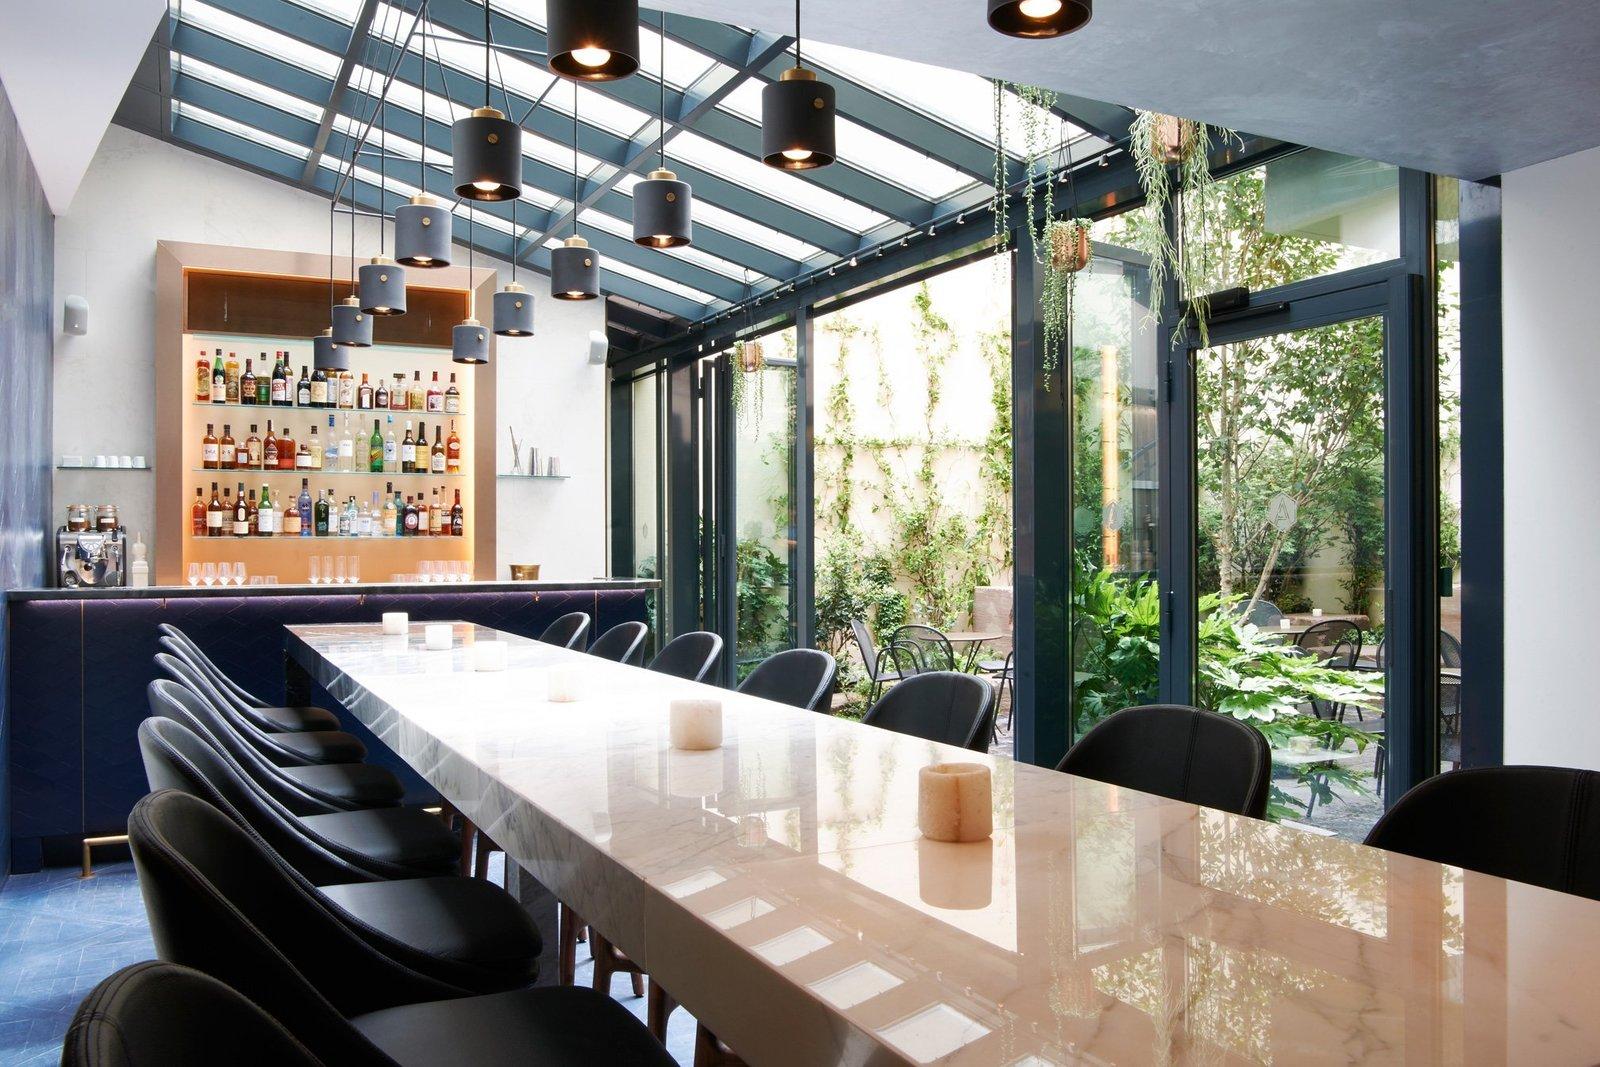 Dining Room, Table, Stools, Bar, and Pendant Lighting  Amastan Paris